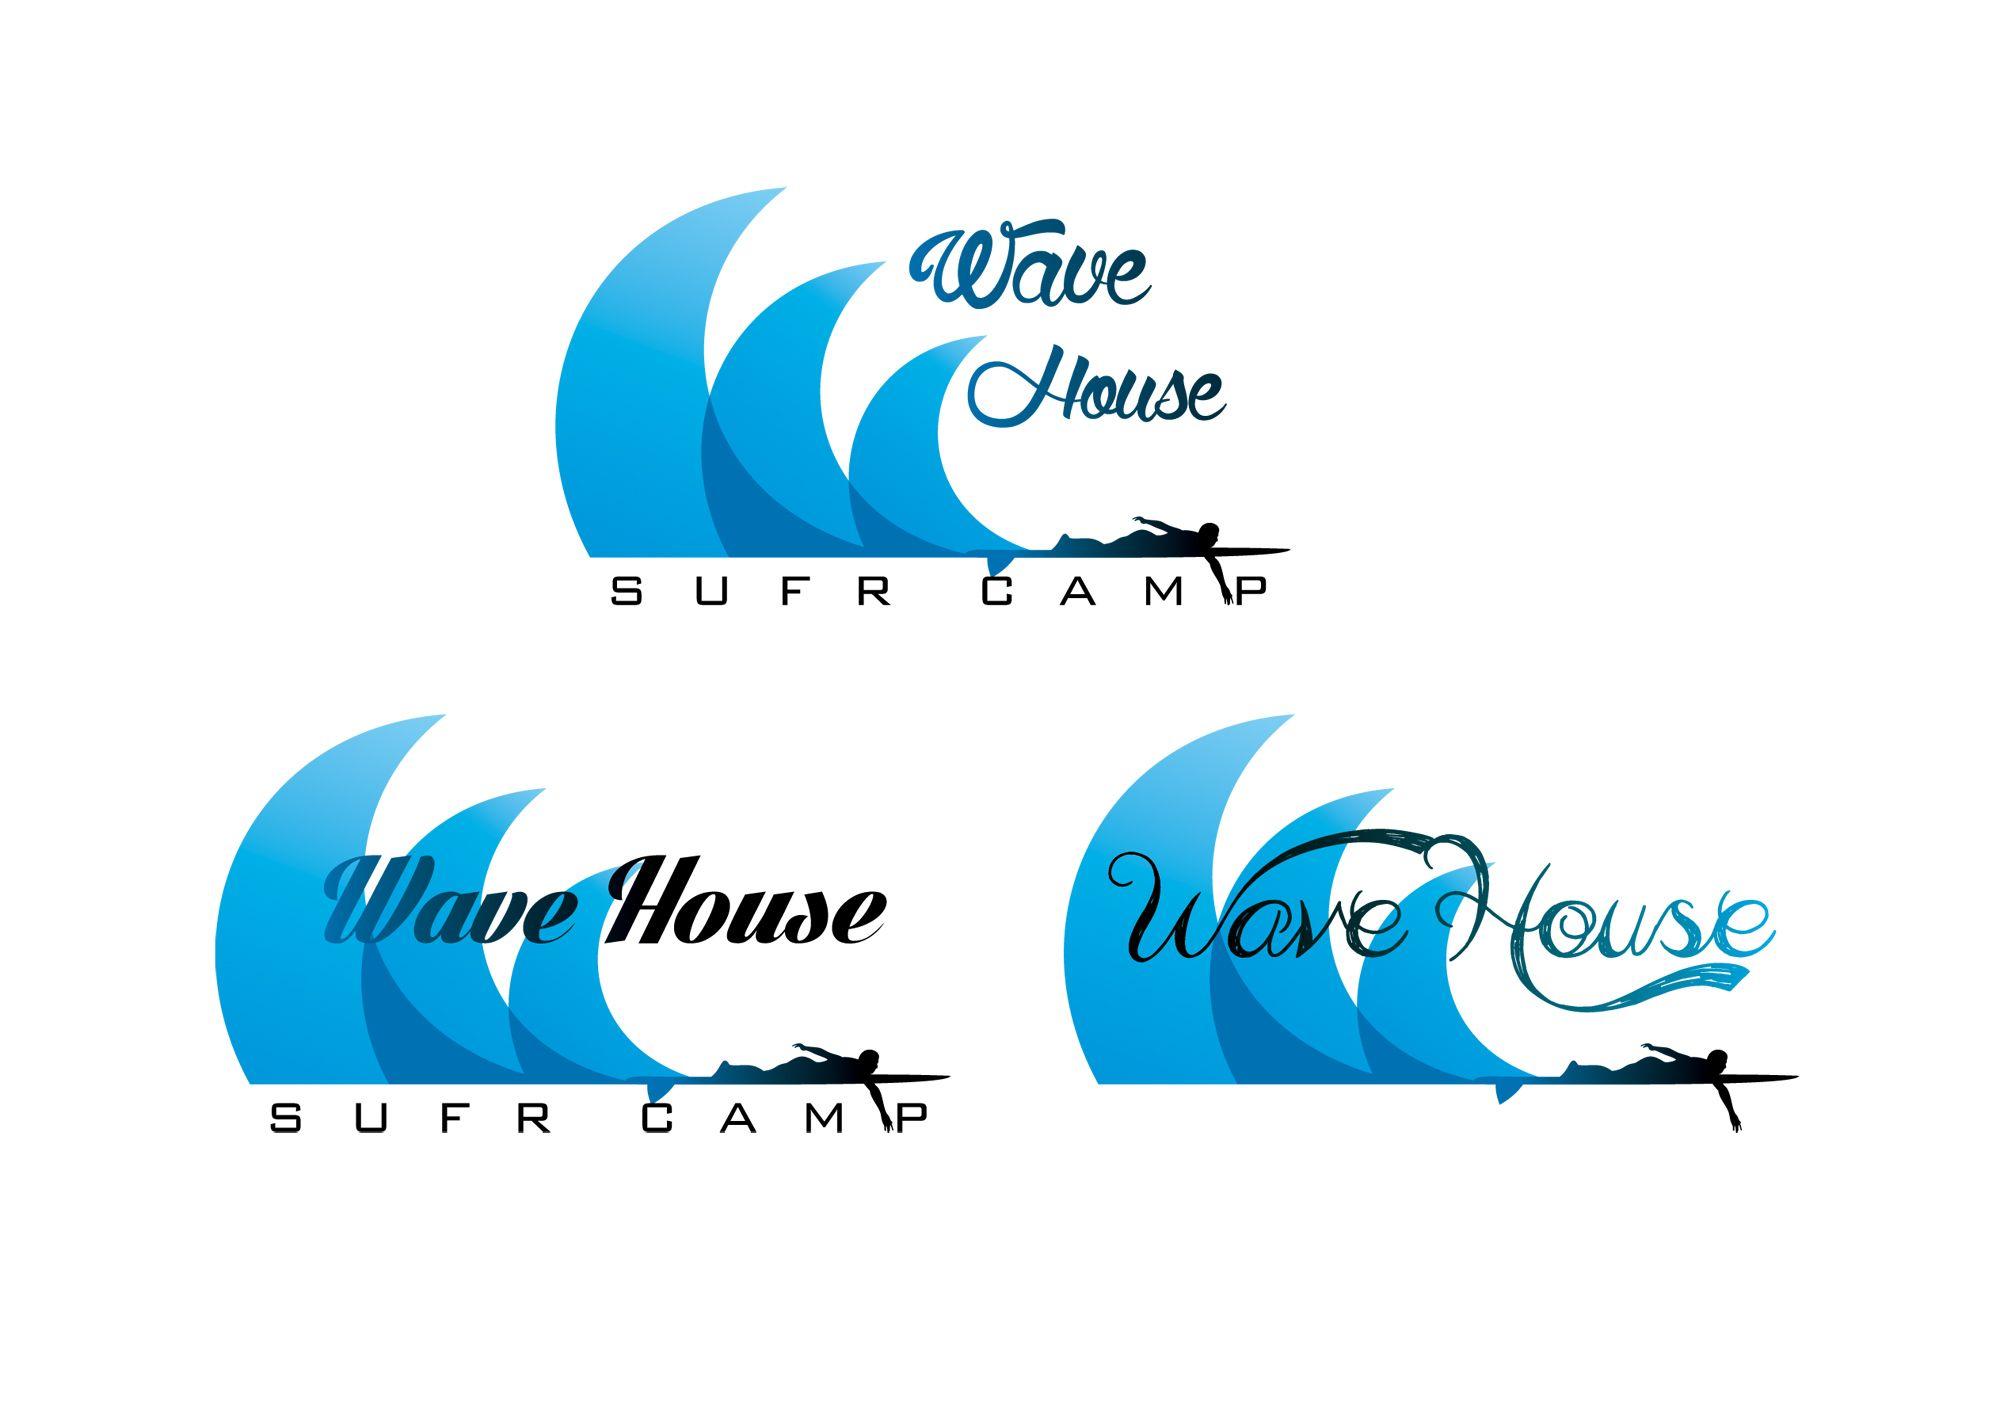 Редизайн логотипа для серф-кэмпа на Бали - дизайнер R-A-M